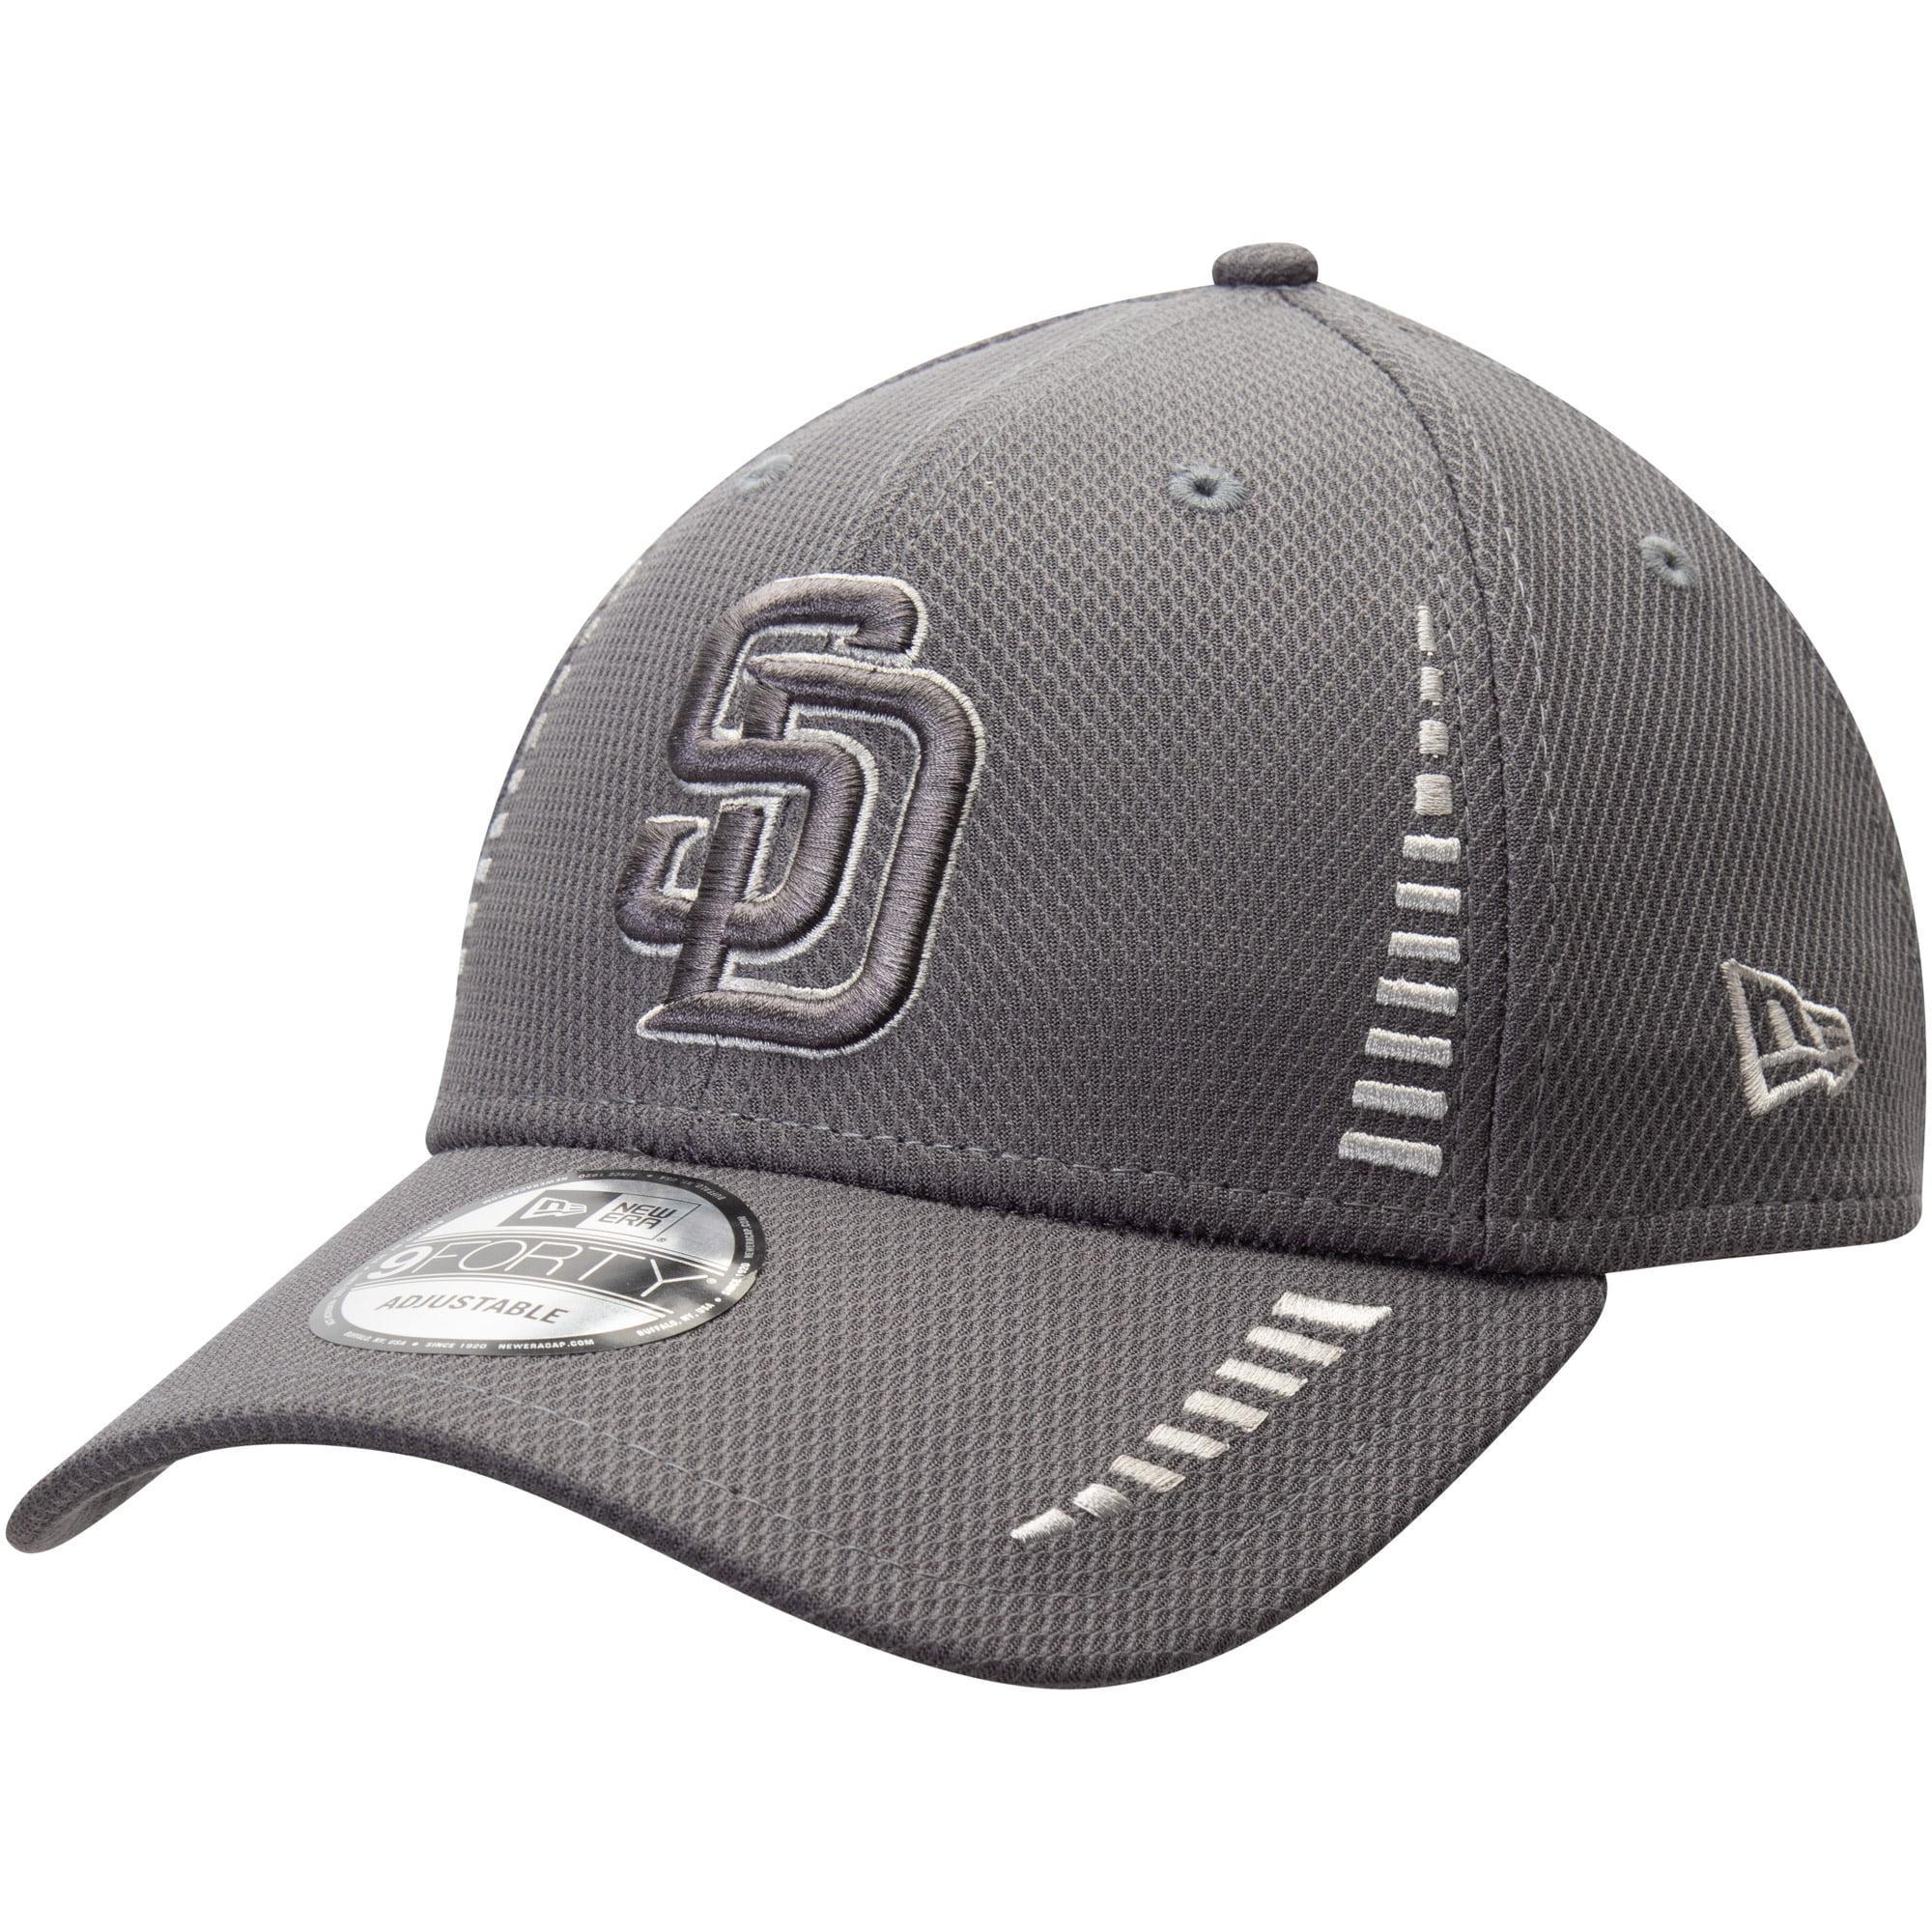 San Diego Padres New Era Speed Tech 9FORTY Adjustable Hat - Graphite - OSFA